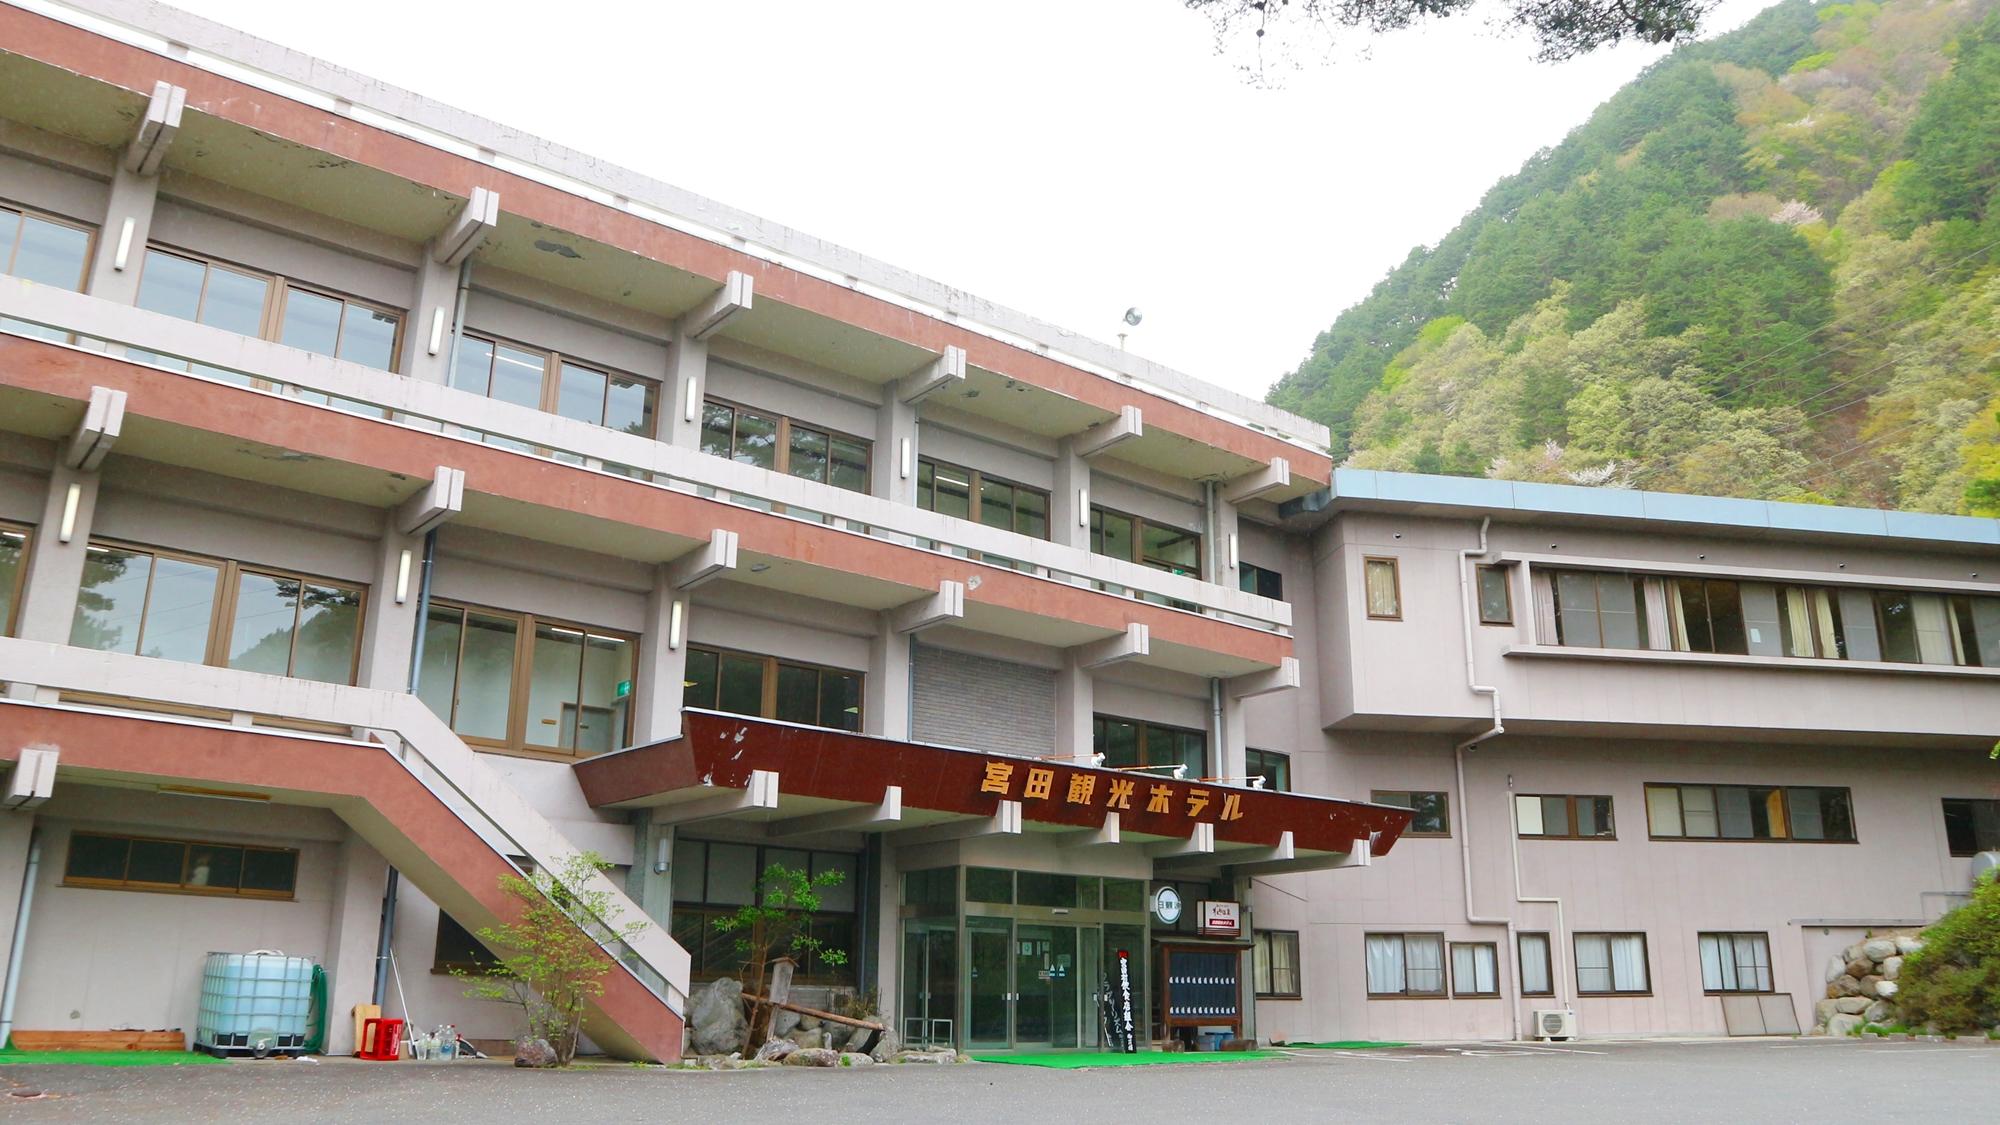 早太郎温泉 宮田観光ホテル 松雲閣